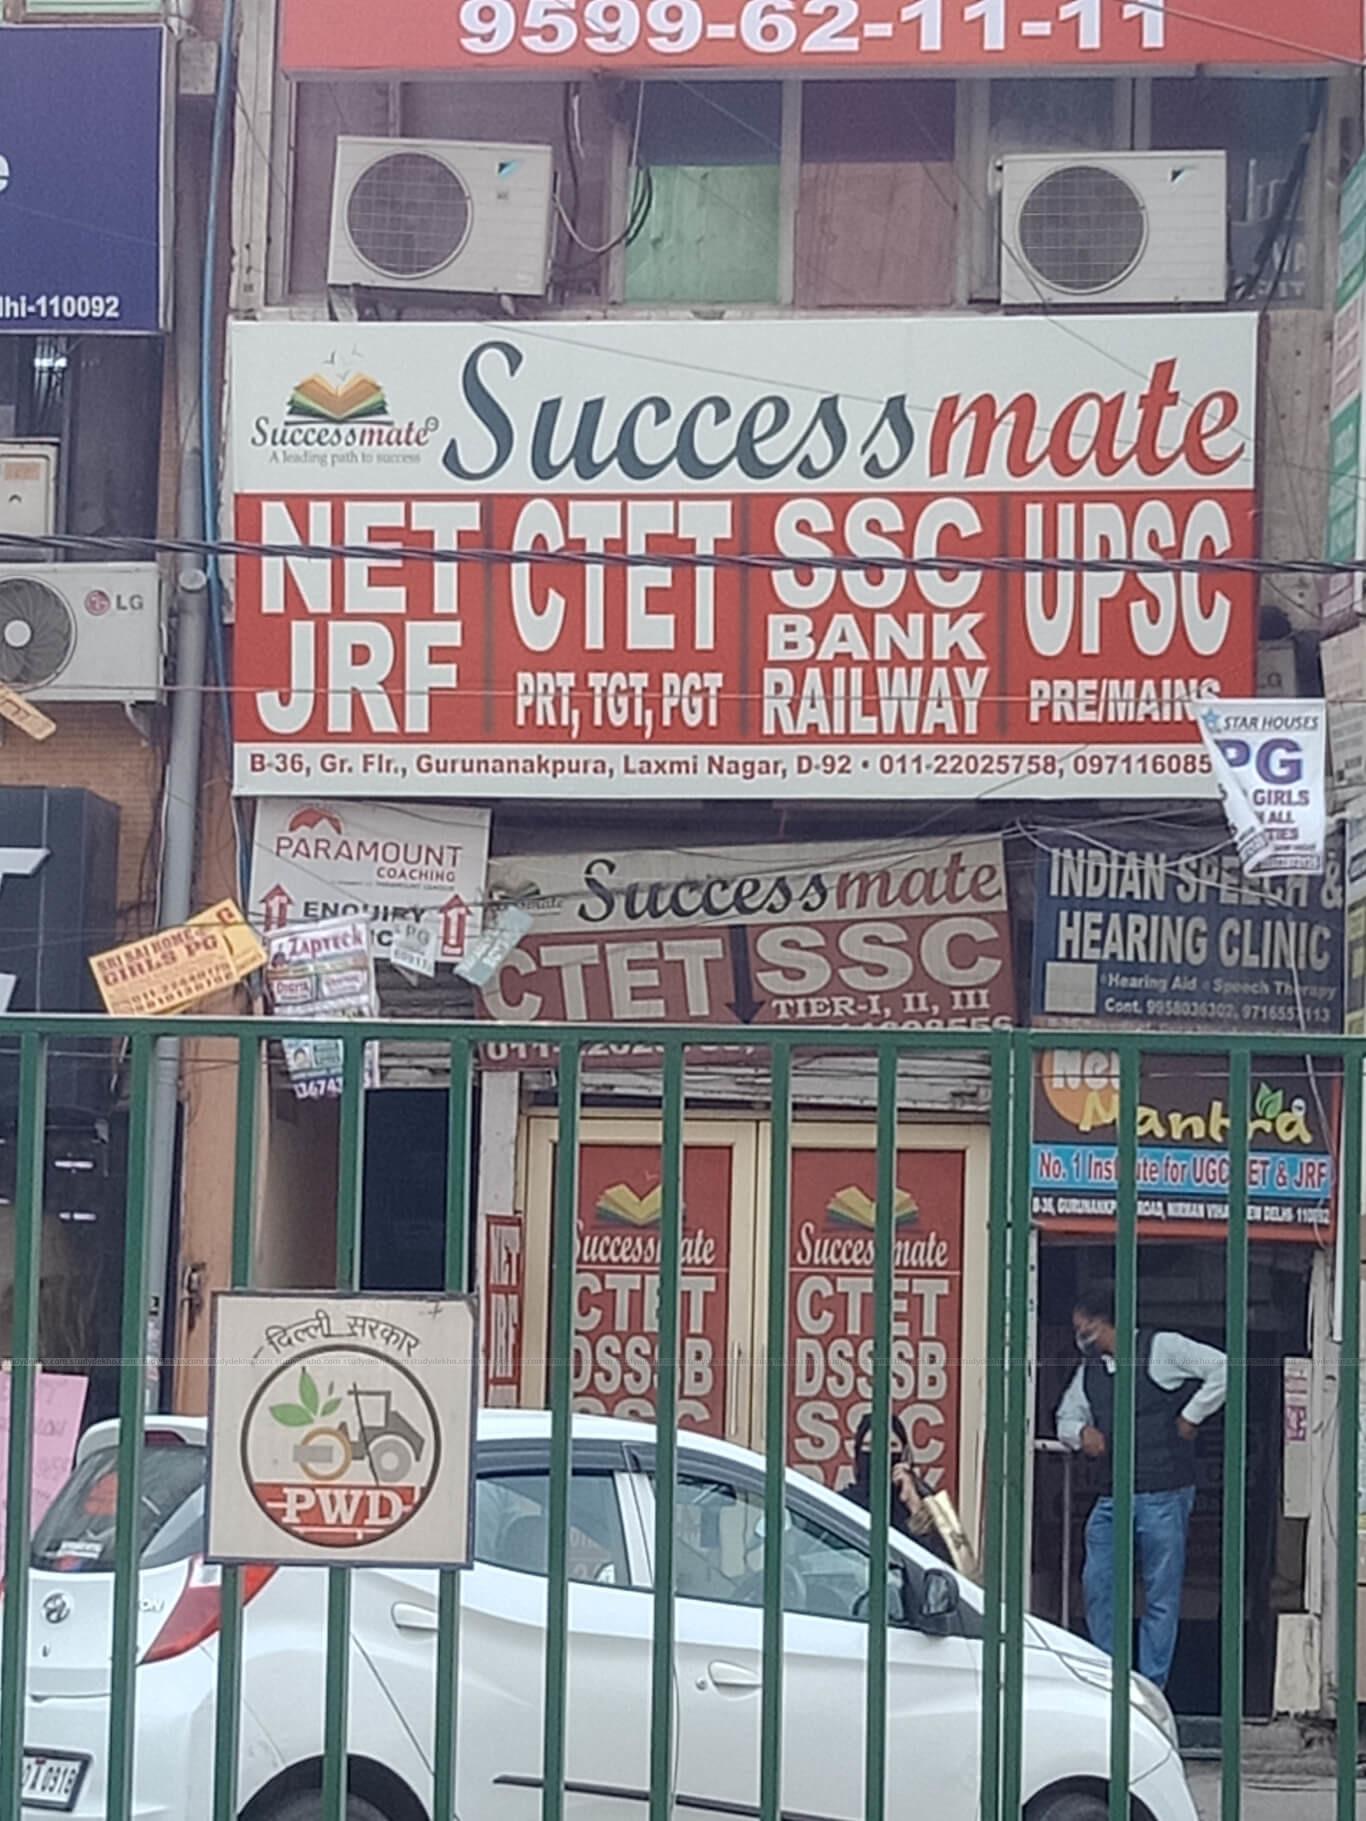 Successmate Gallery